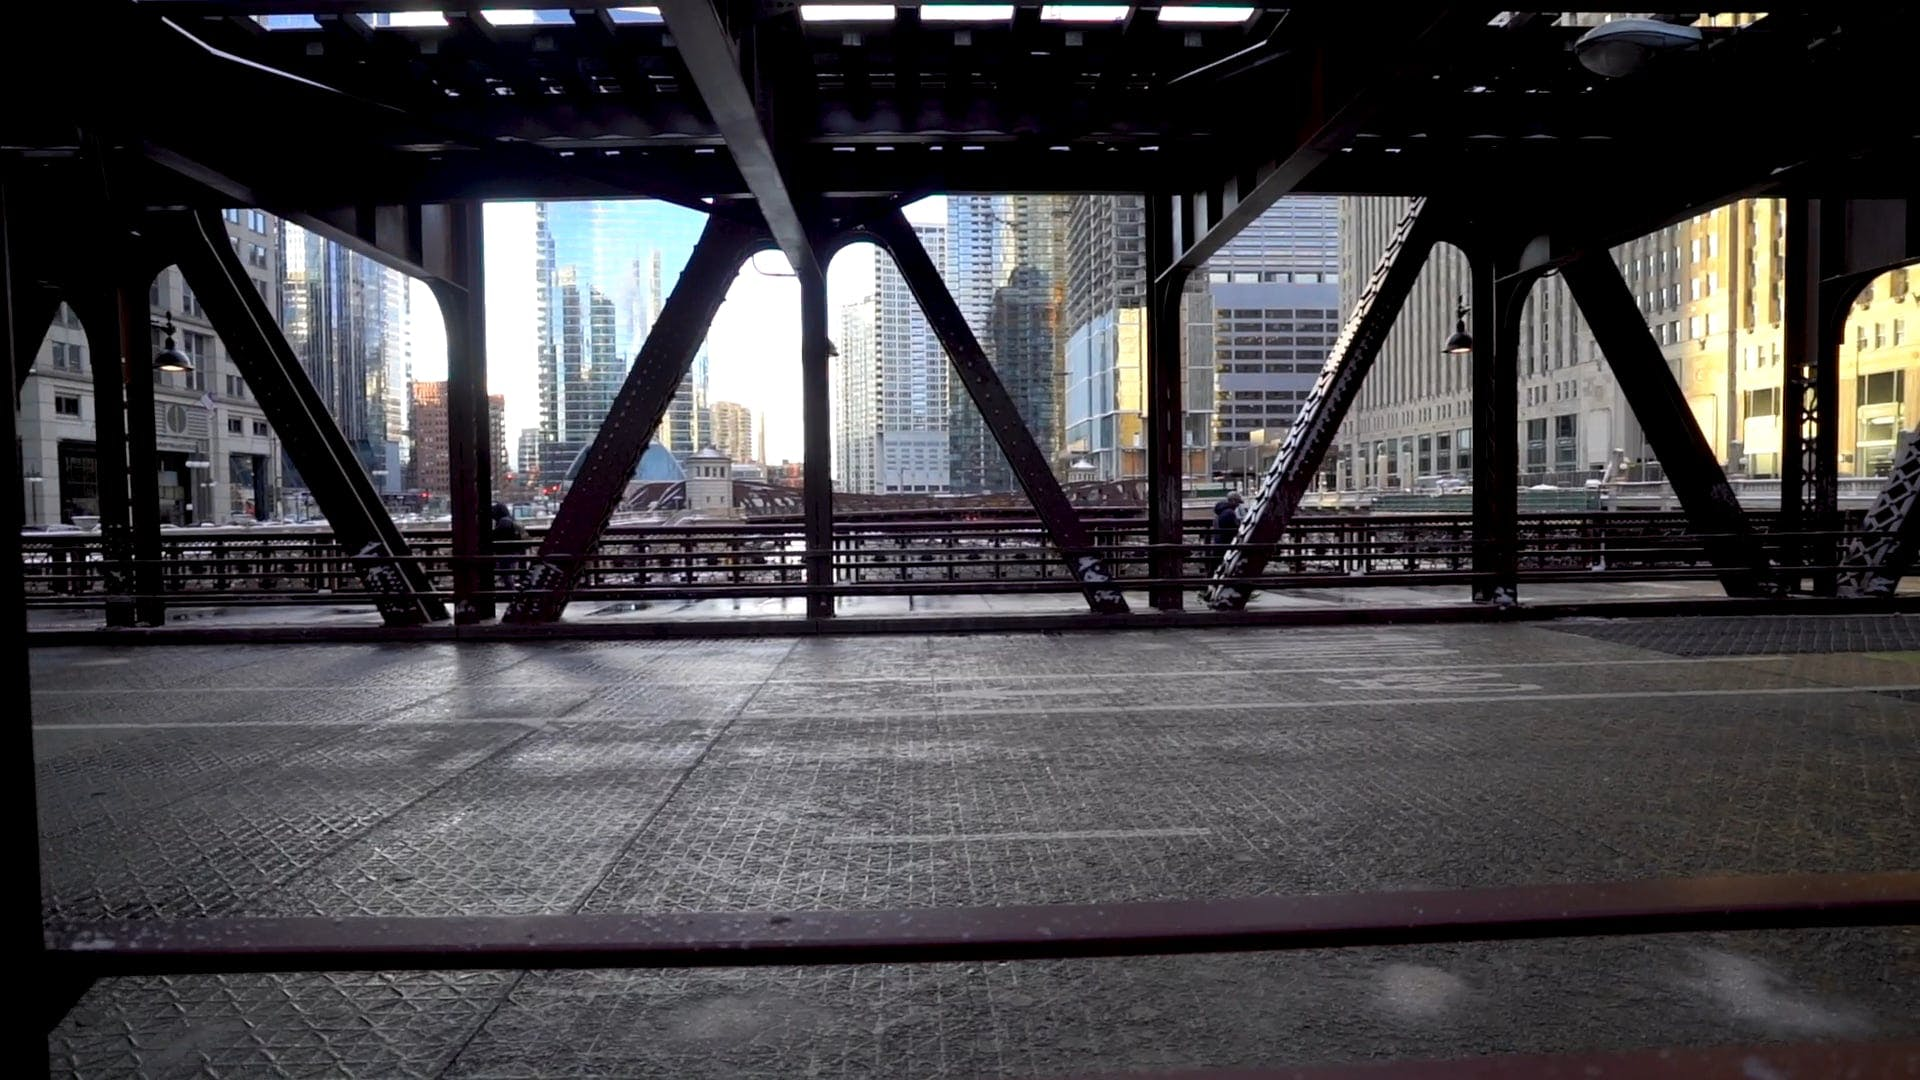 Video Of A Bridge